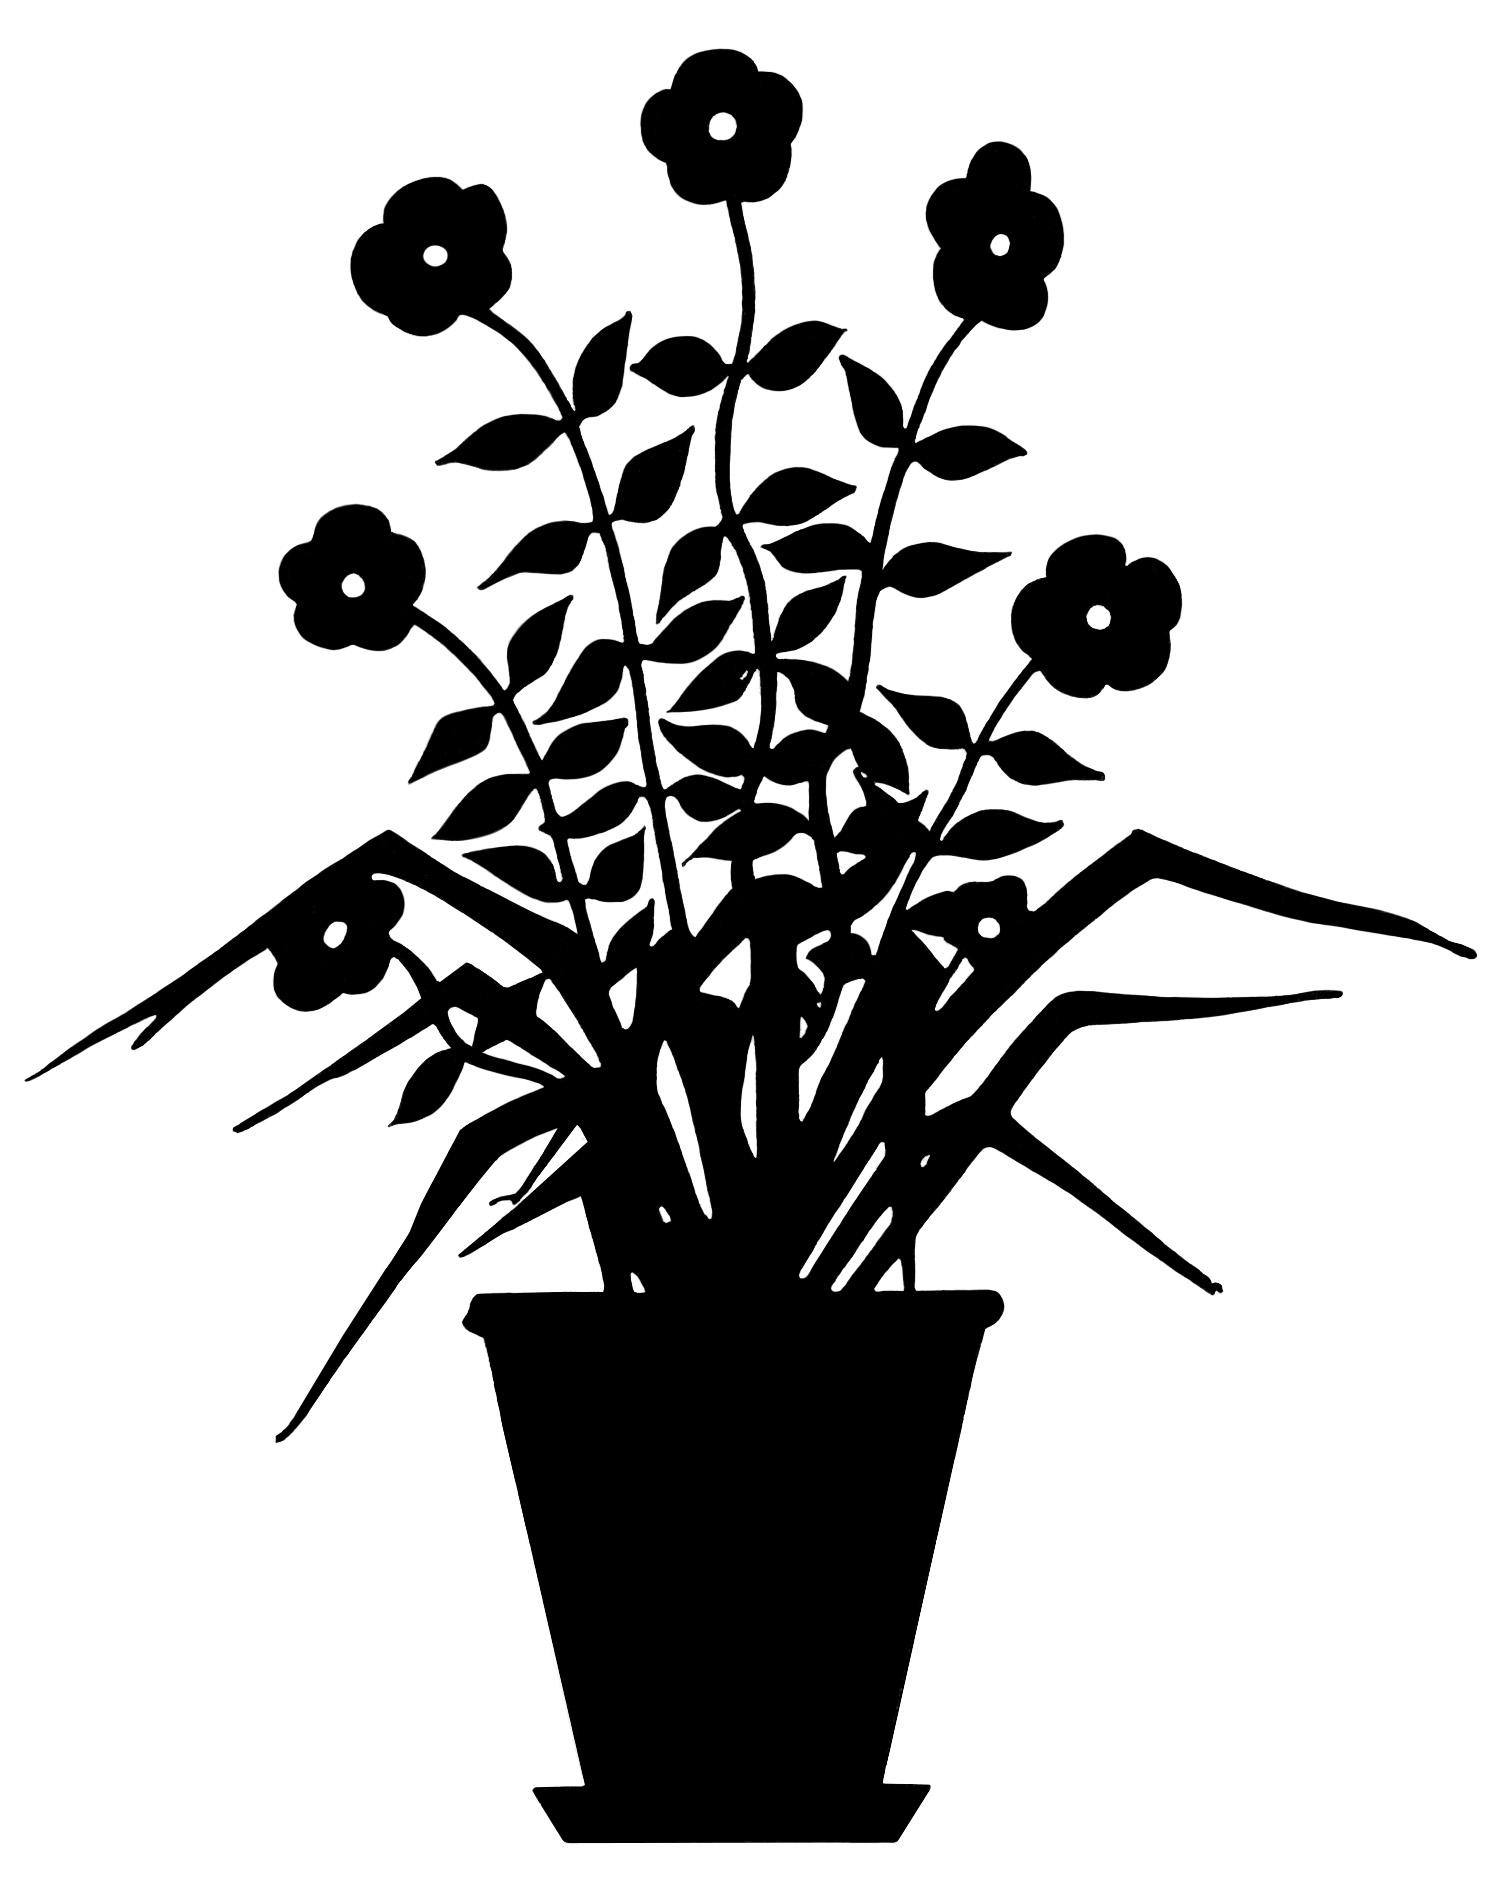 Flowering Plant Silhouette | Old Design Shop Blog